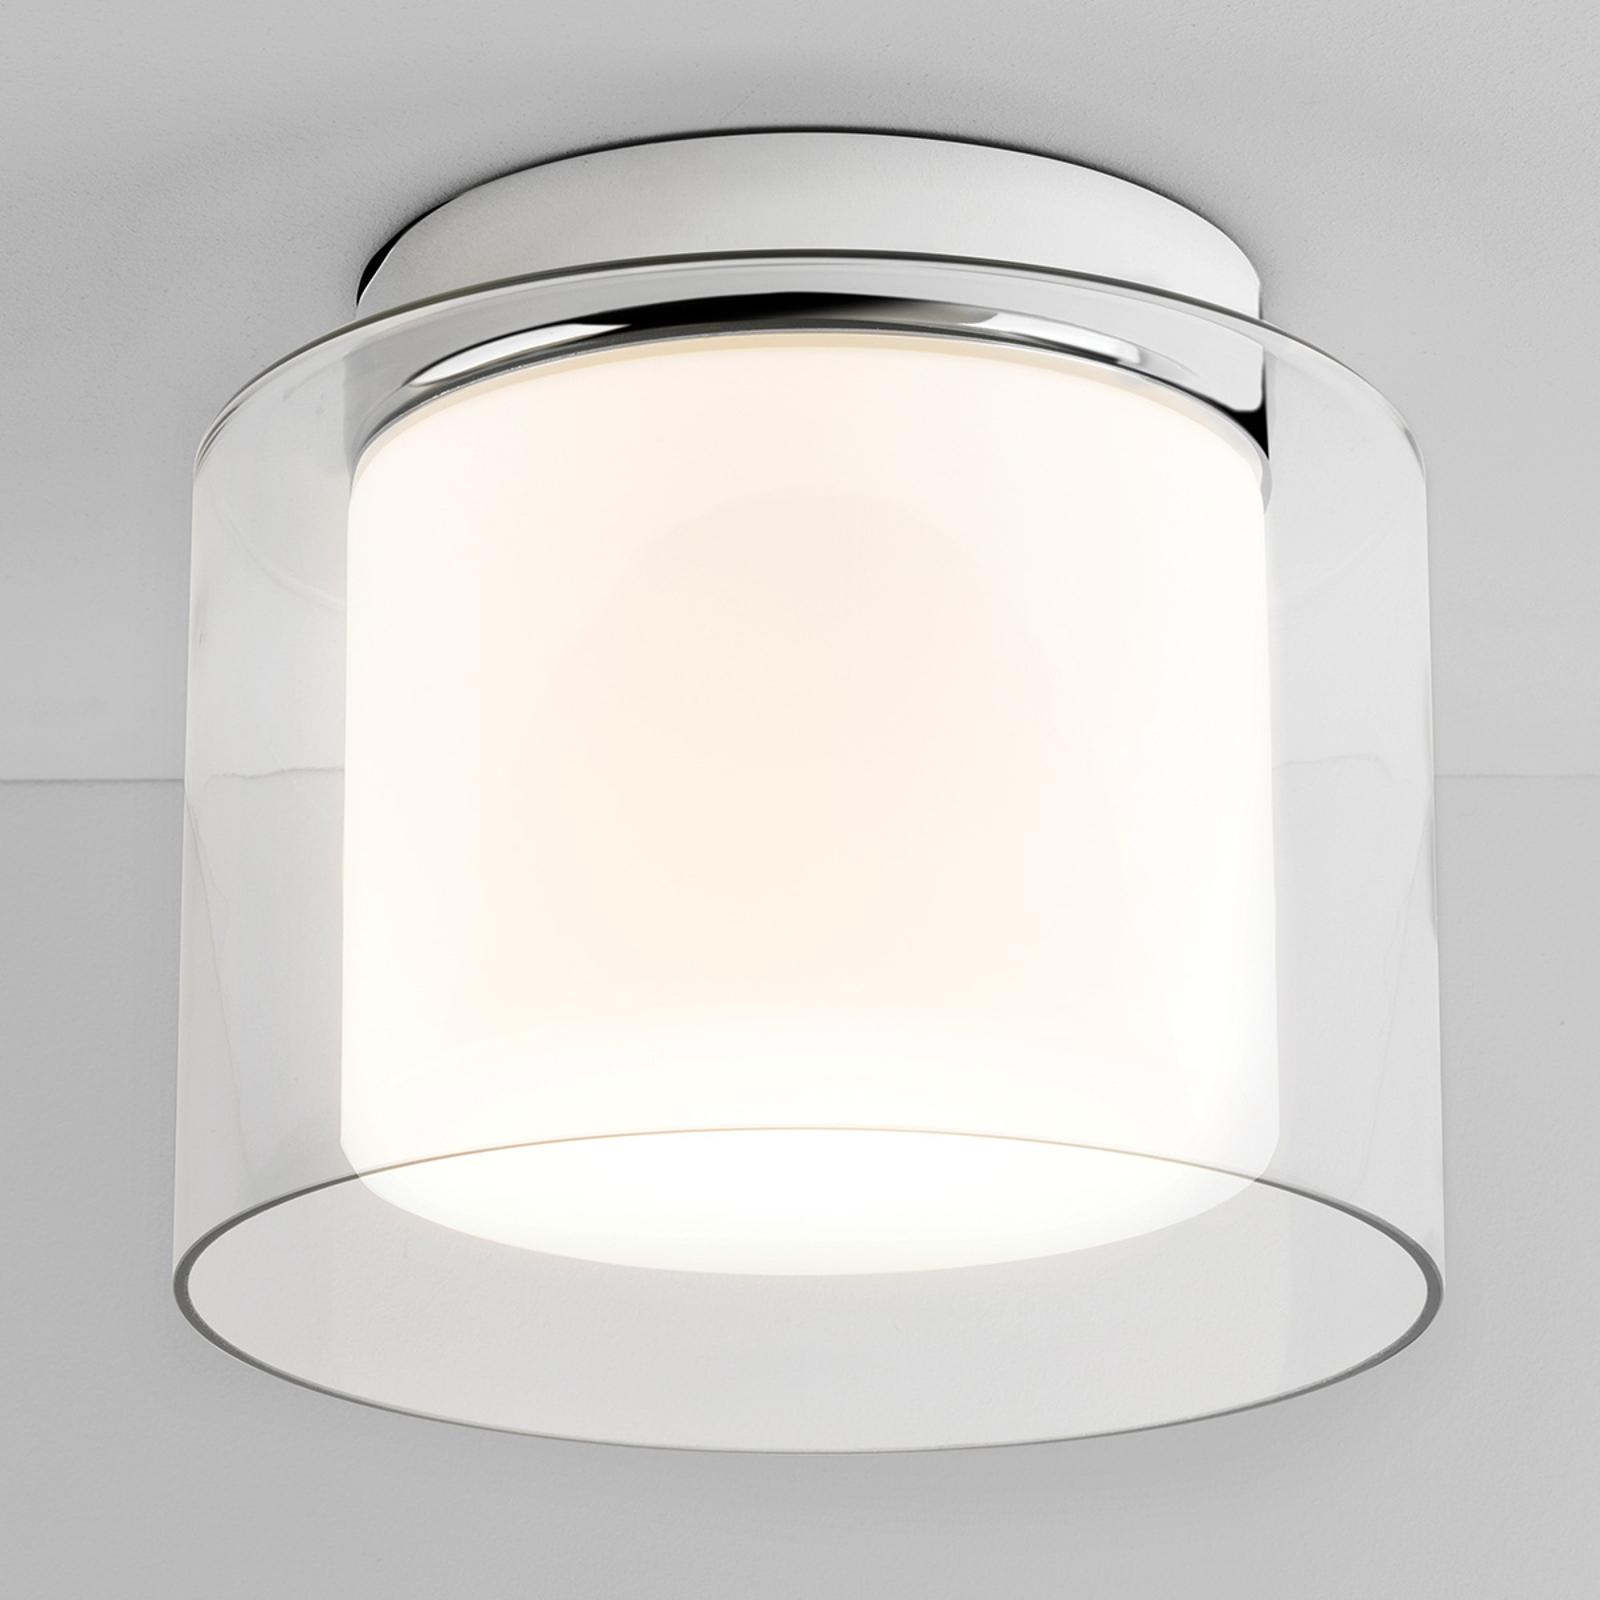 Dubbel verglaasde plafondlamp AREZZO